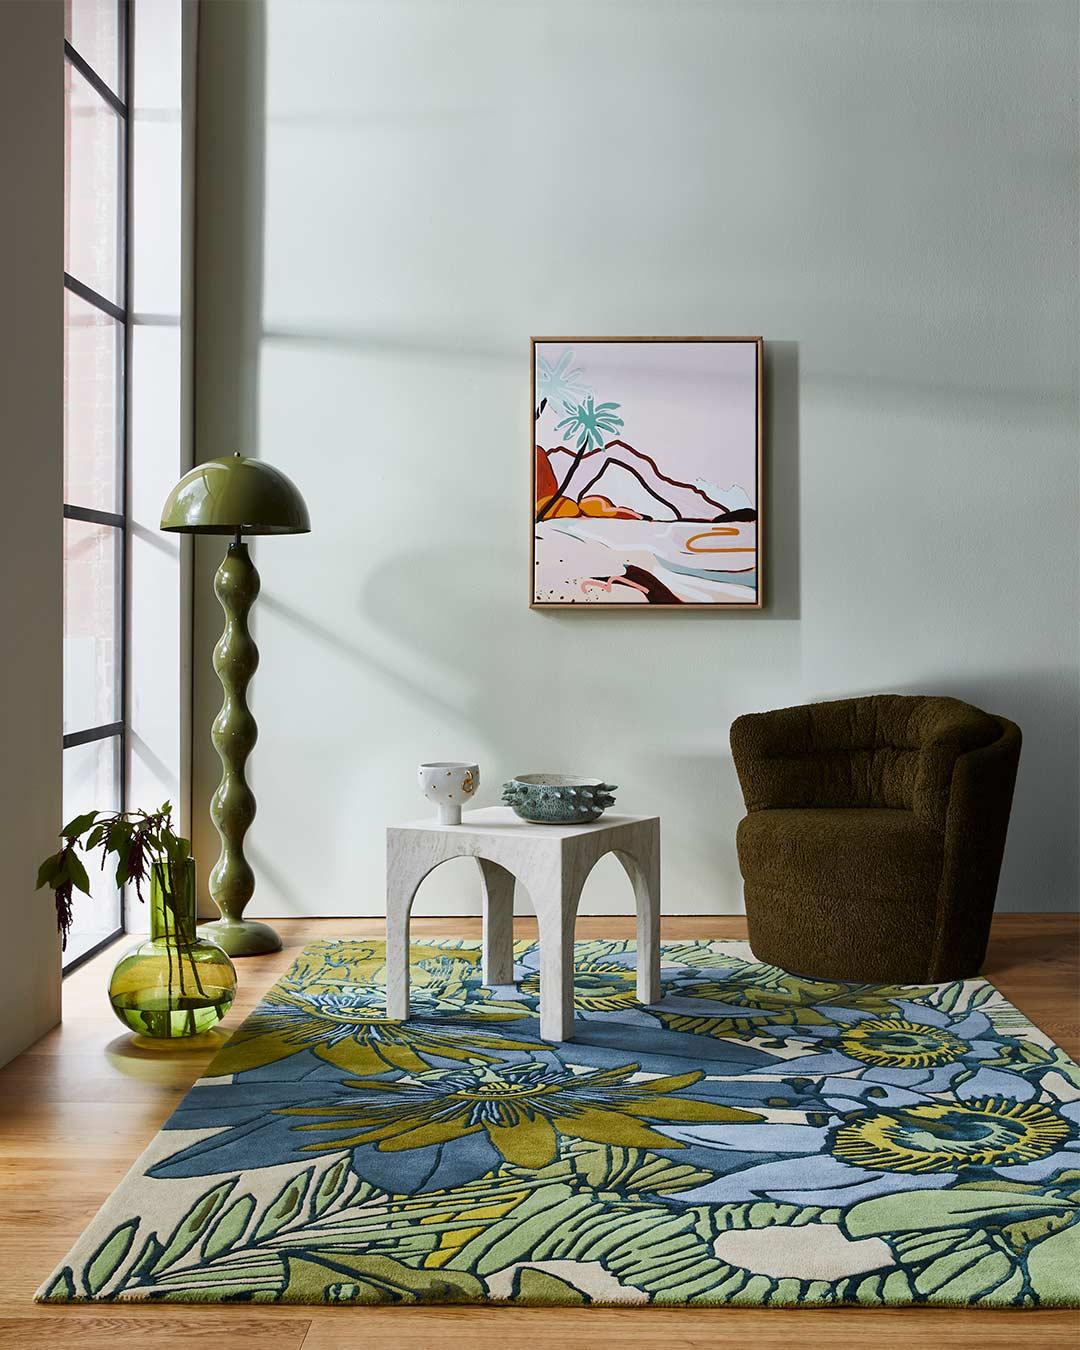 Living room image of floral Wailoa rug